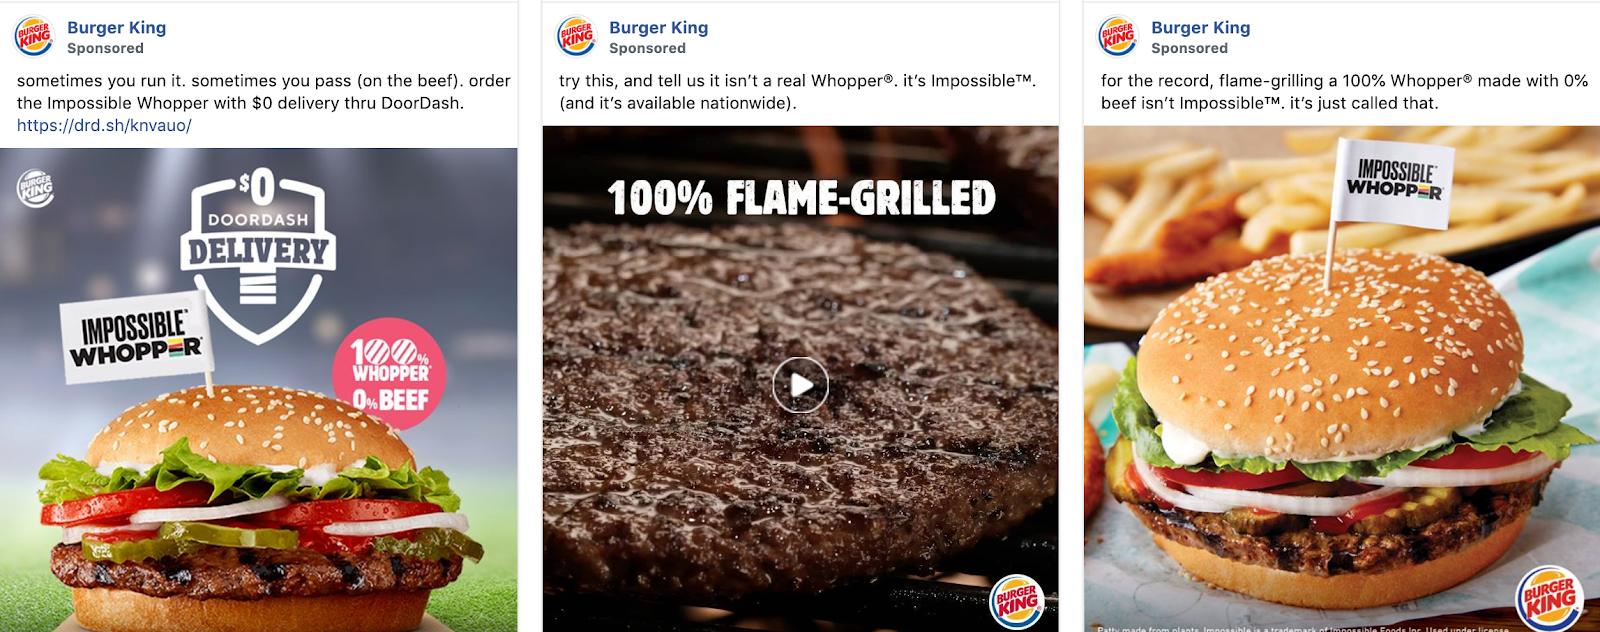 Global Marketing Strategy: Screenshot of Burger King